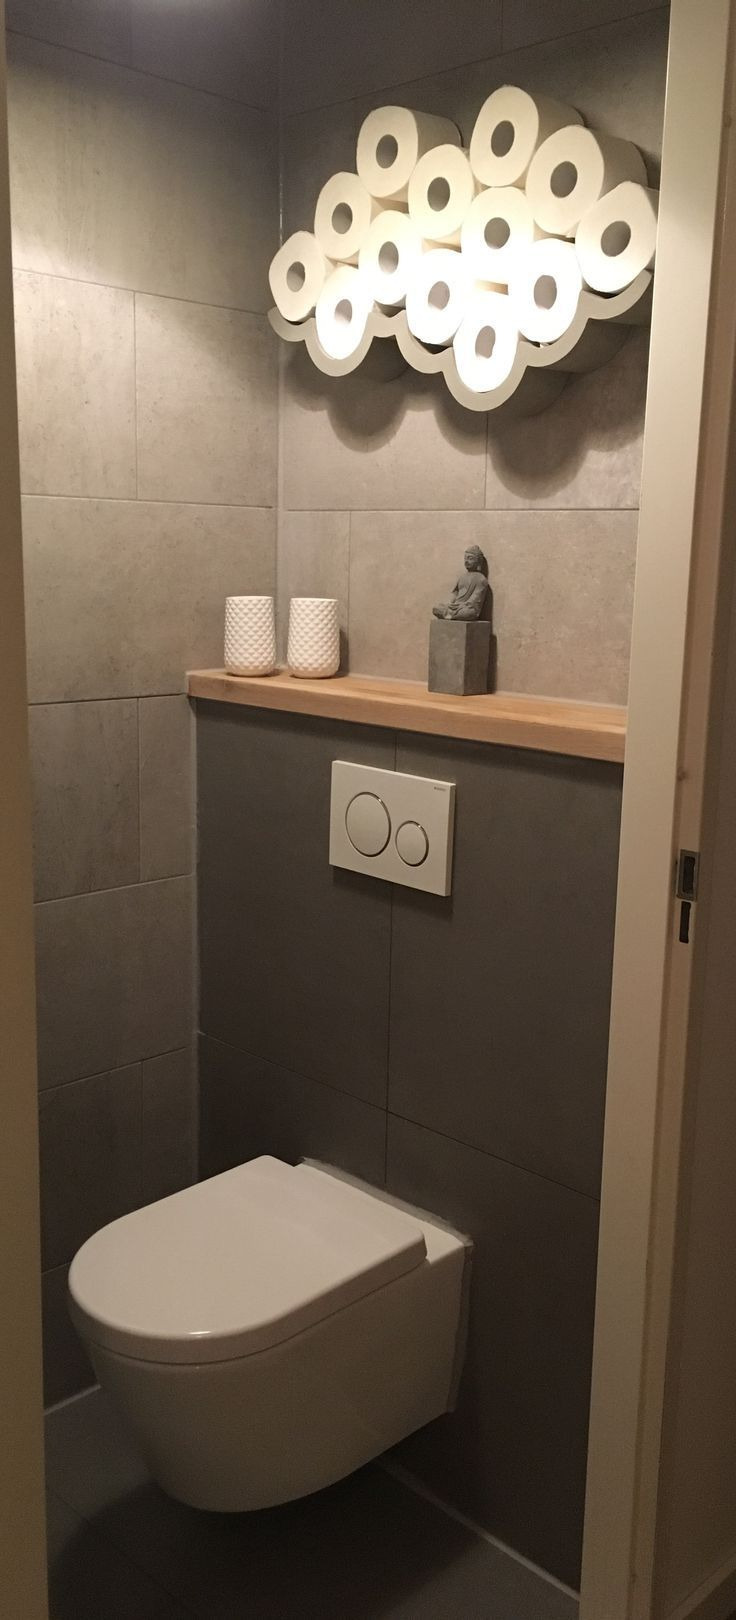 Small Bathroom  C B Toilet Roll Hive